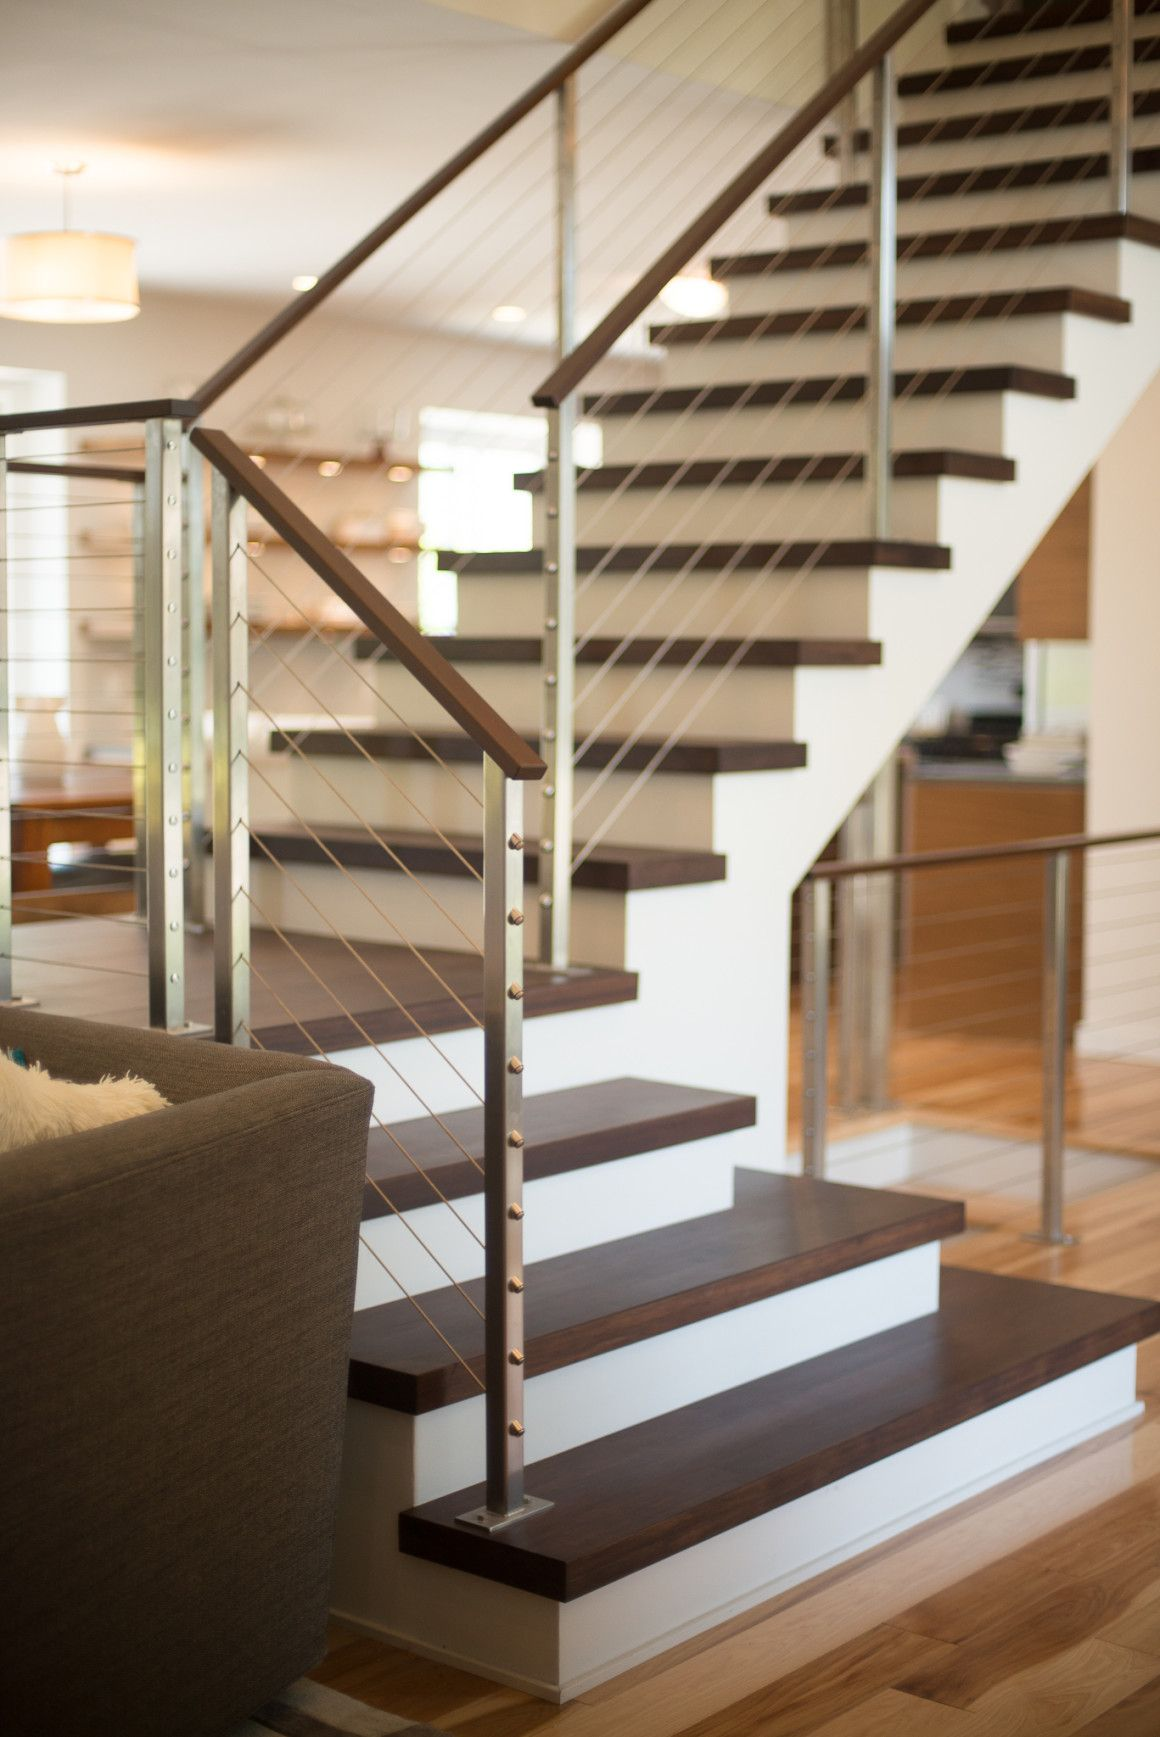 Best Modern Home Remodel South Lyon Michigan Staircase 400 x 300